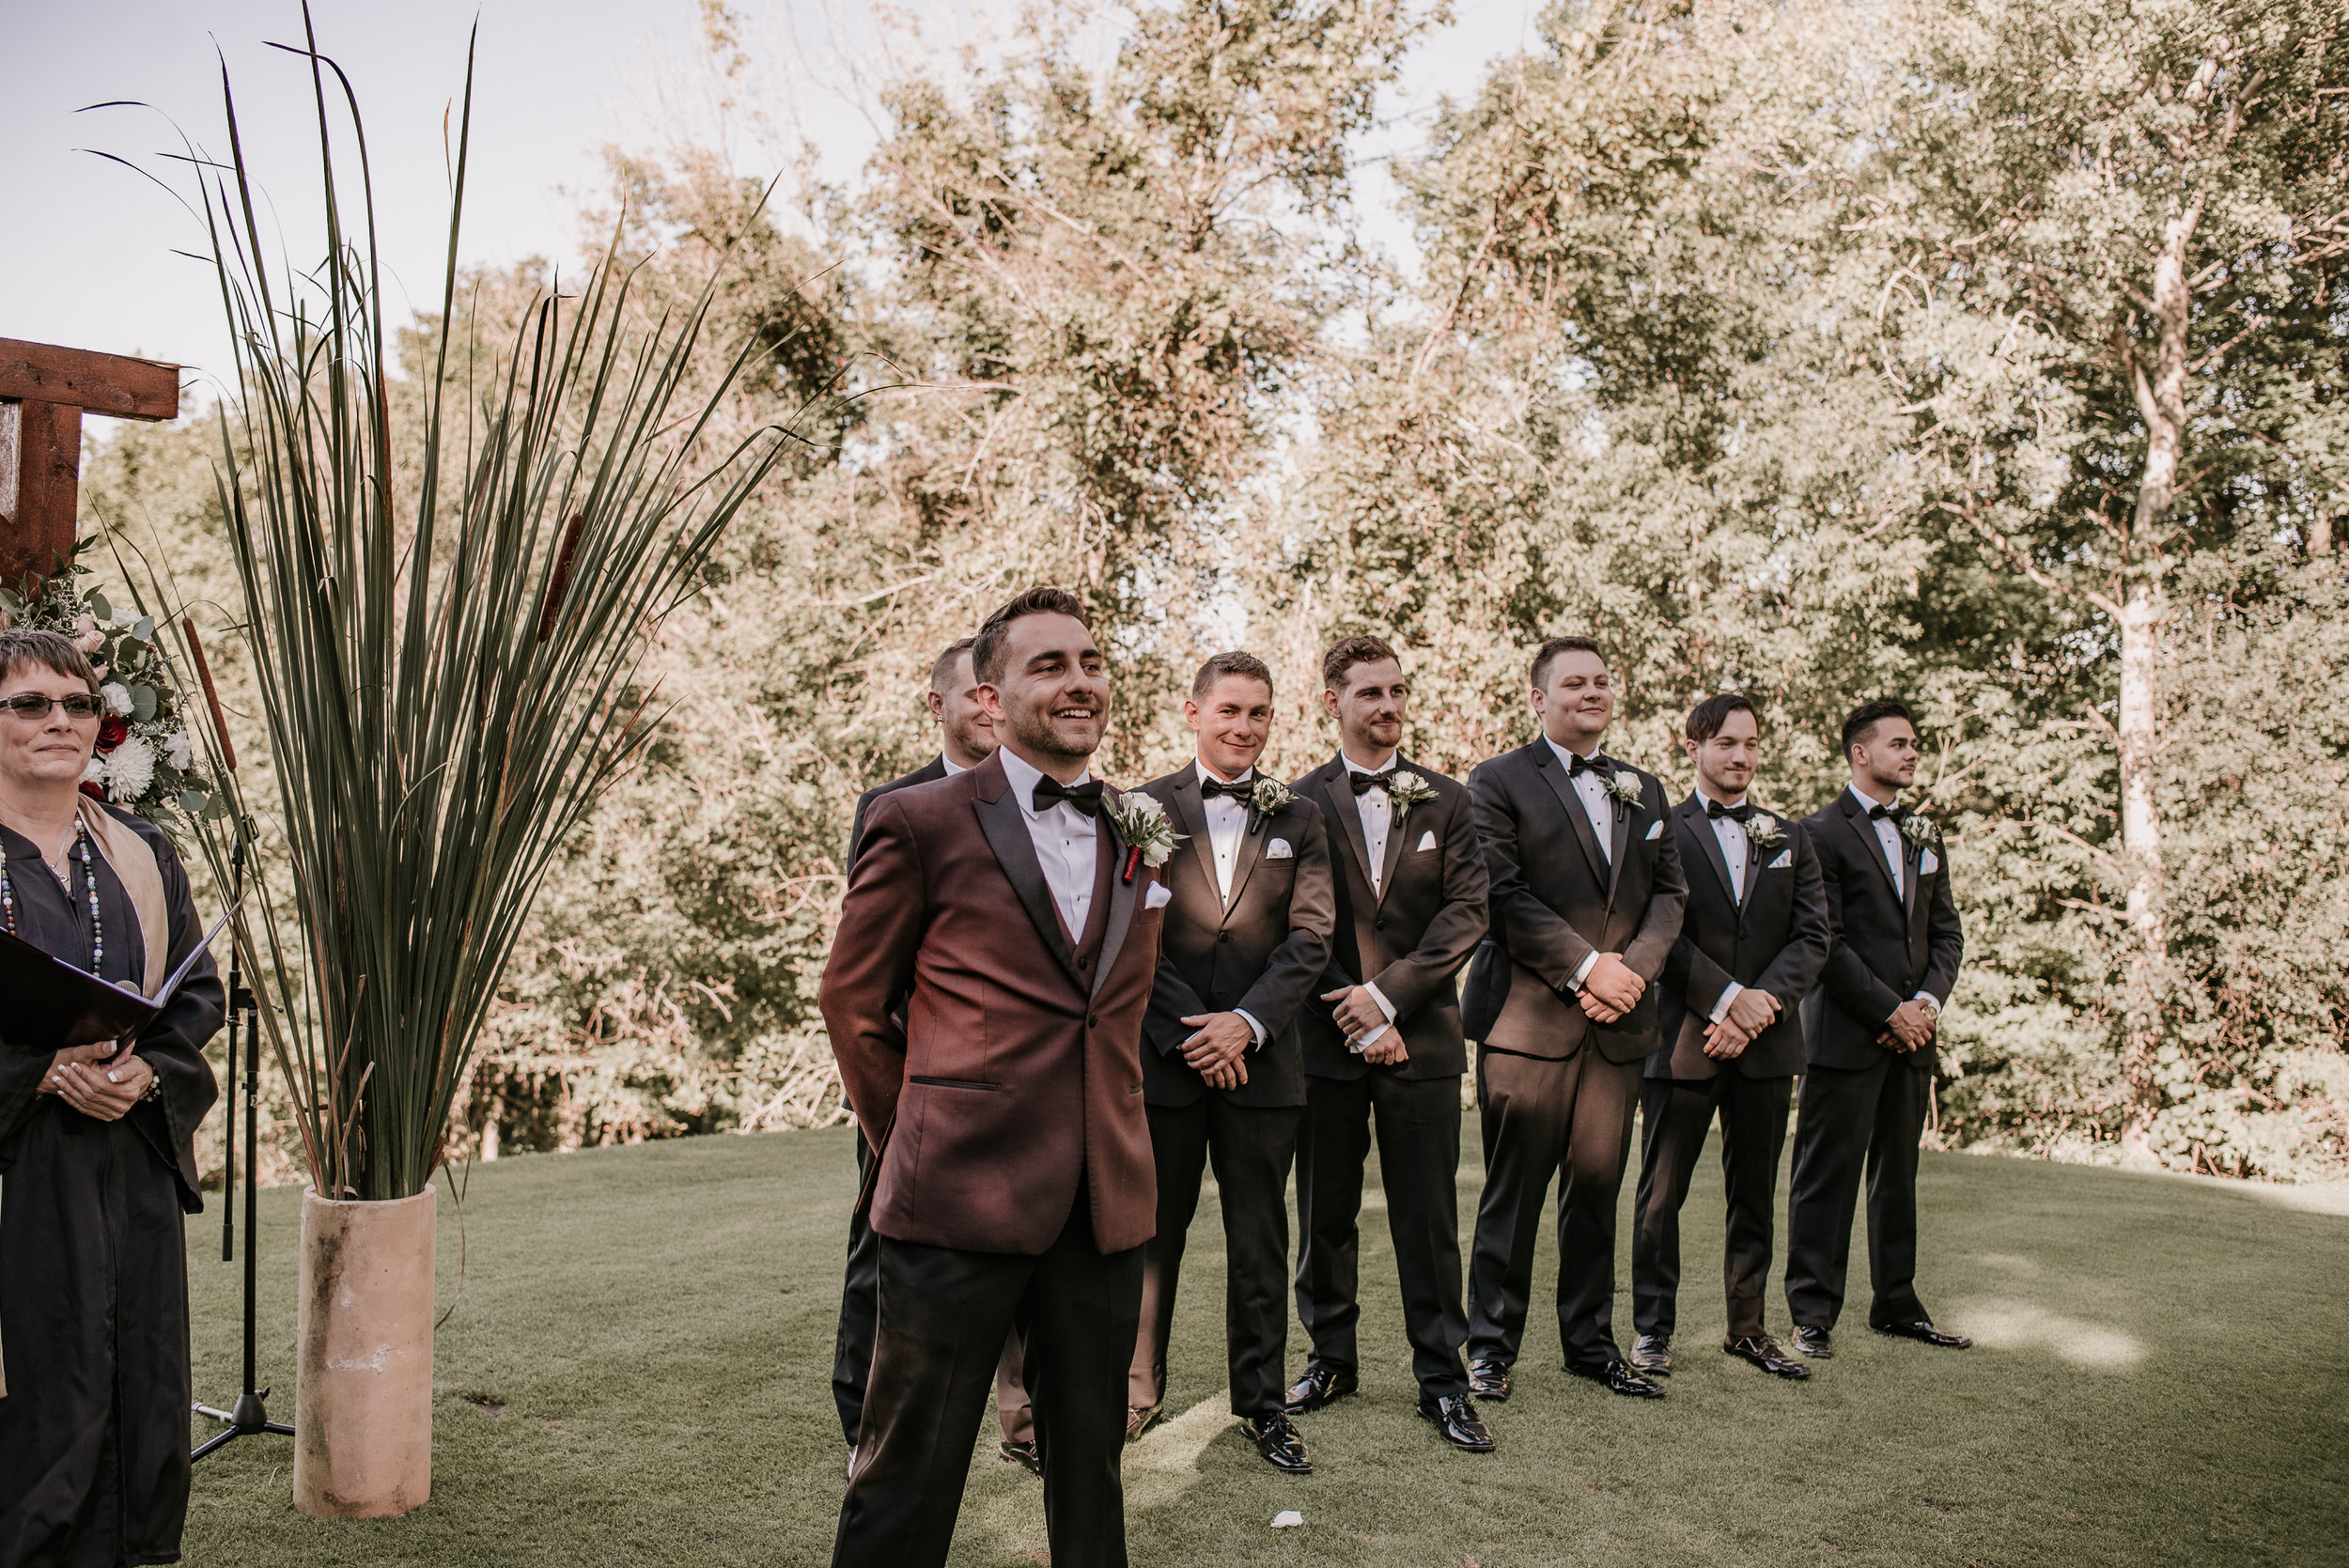 Claremont_fourseasons_Wedding-133.jpg